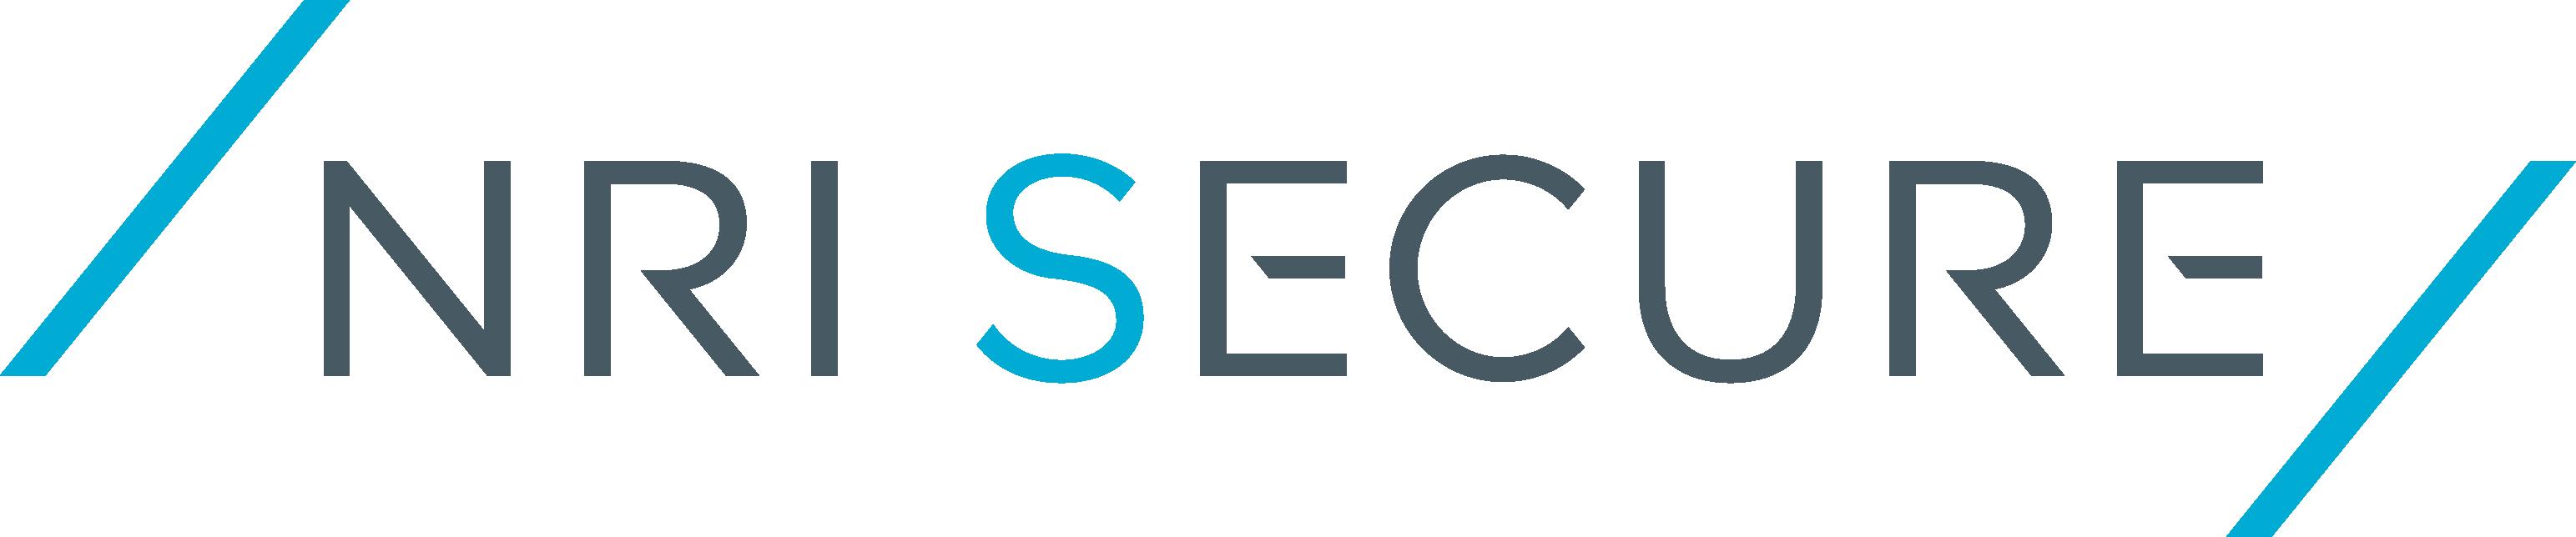 05_brand_logo